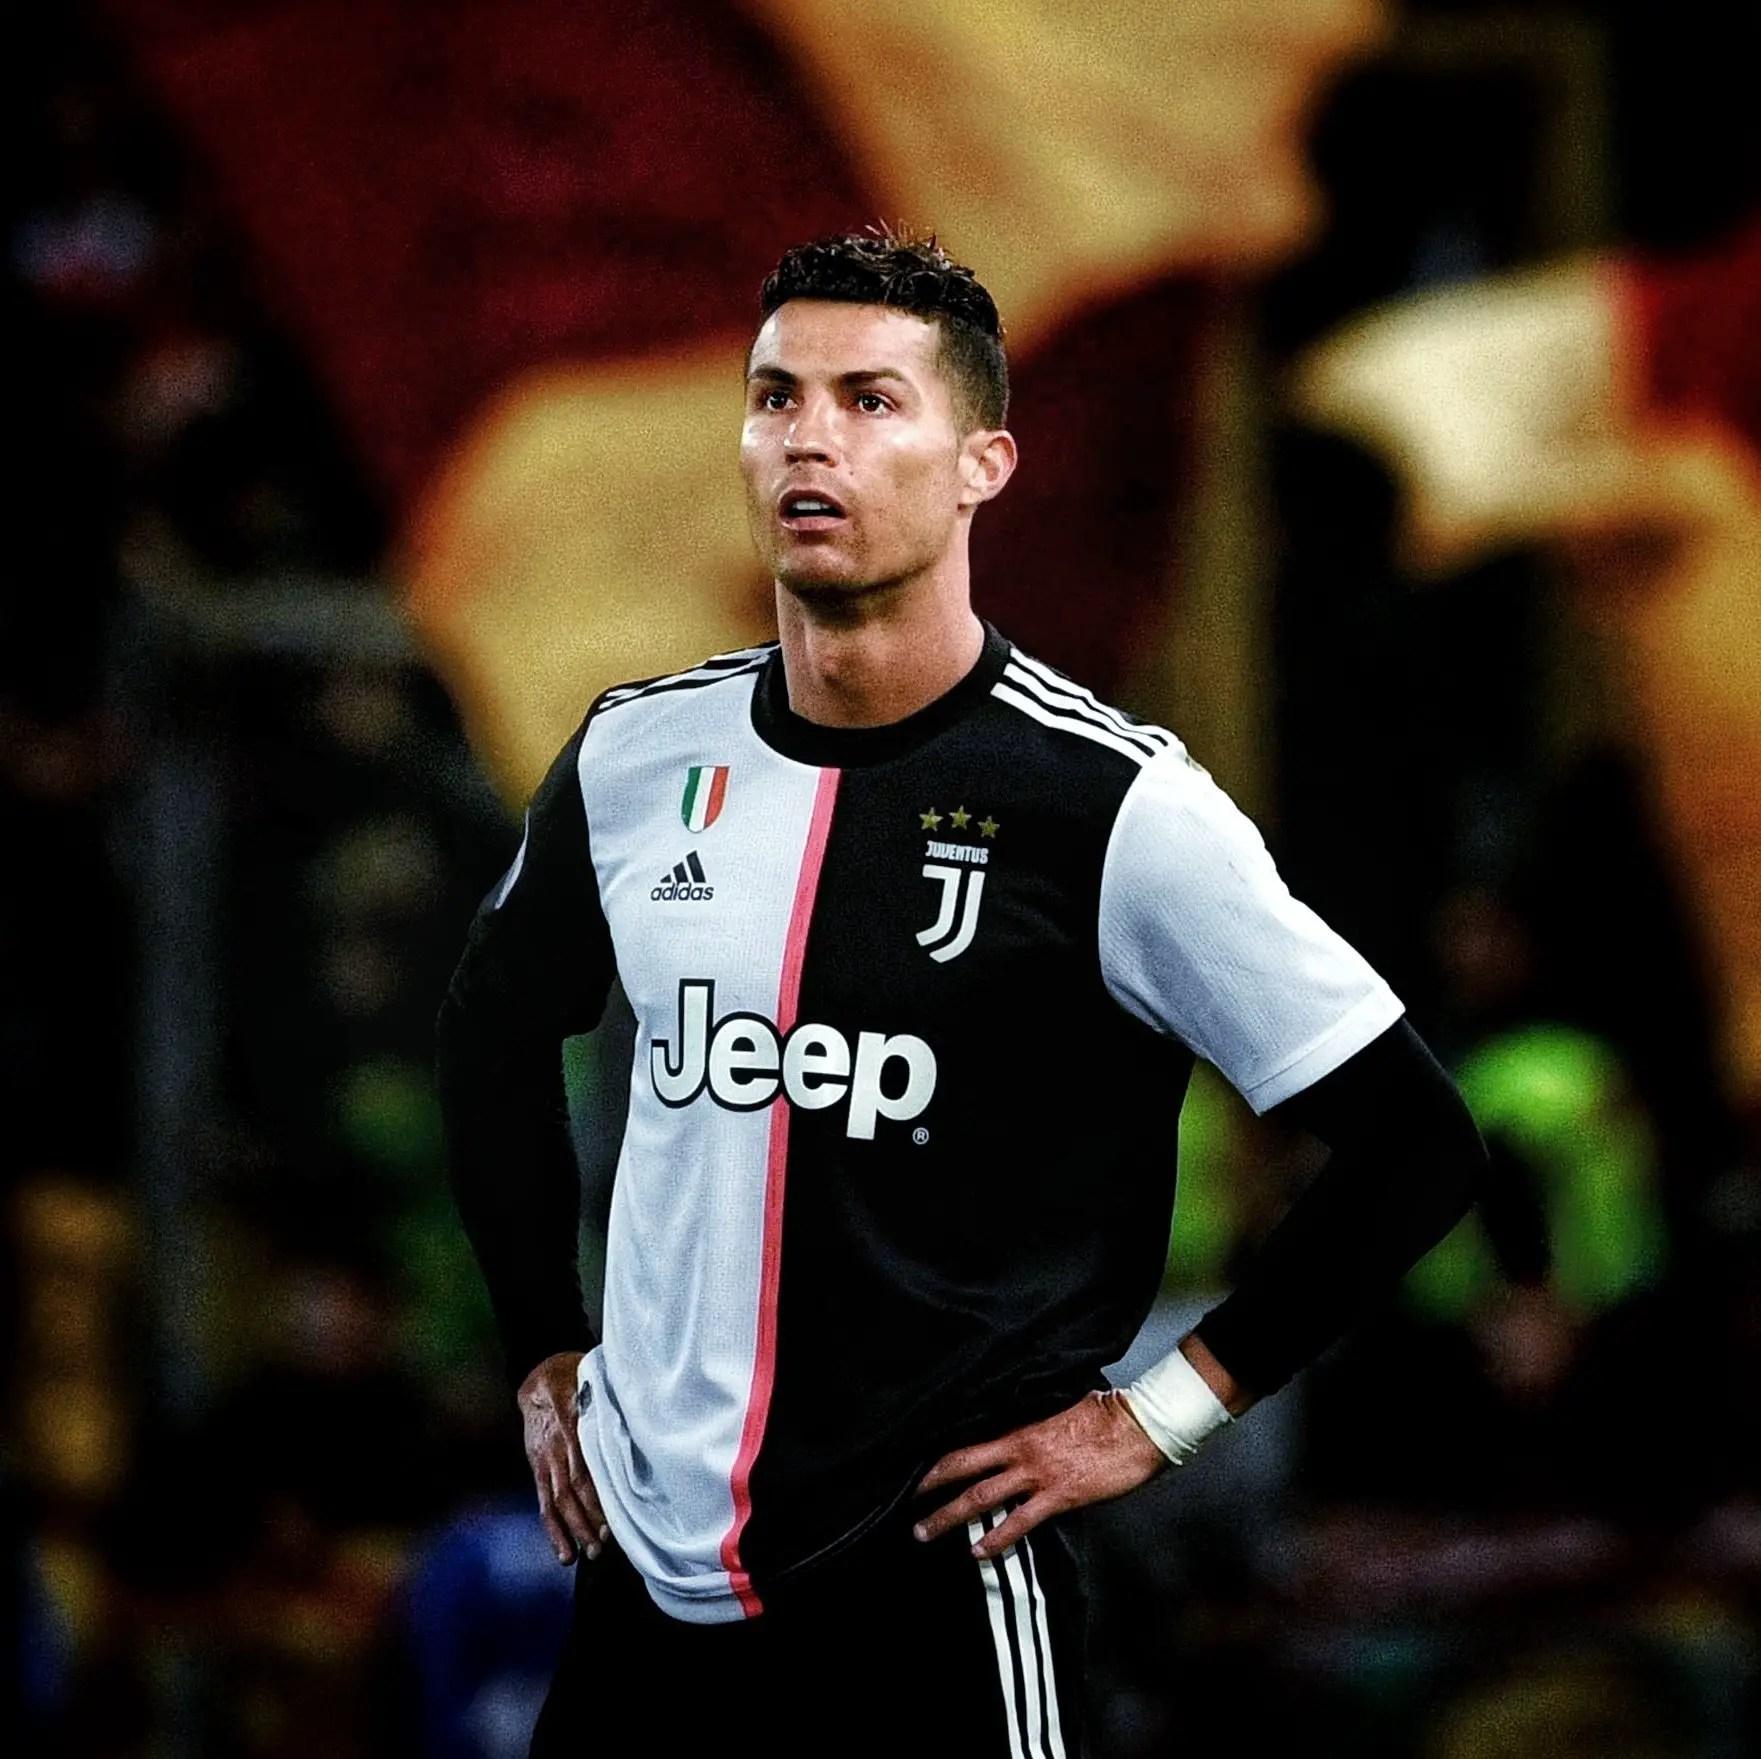 Coppa Italia Semi-Final Matches Air Live On StarTimes